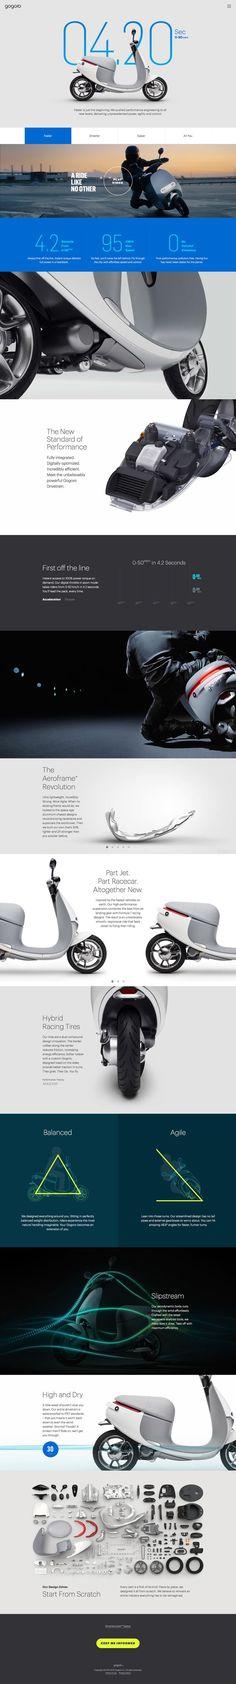 Elegant & Clean Website Design for Scooter Company